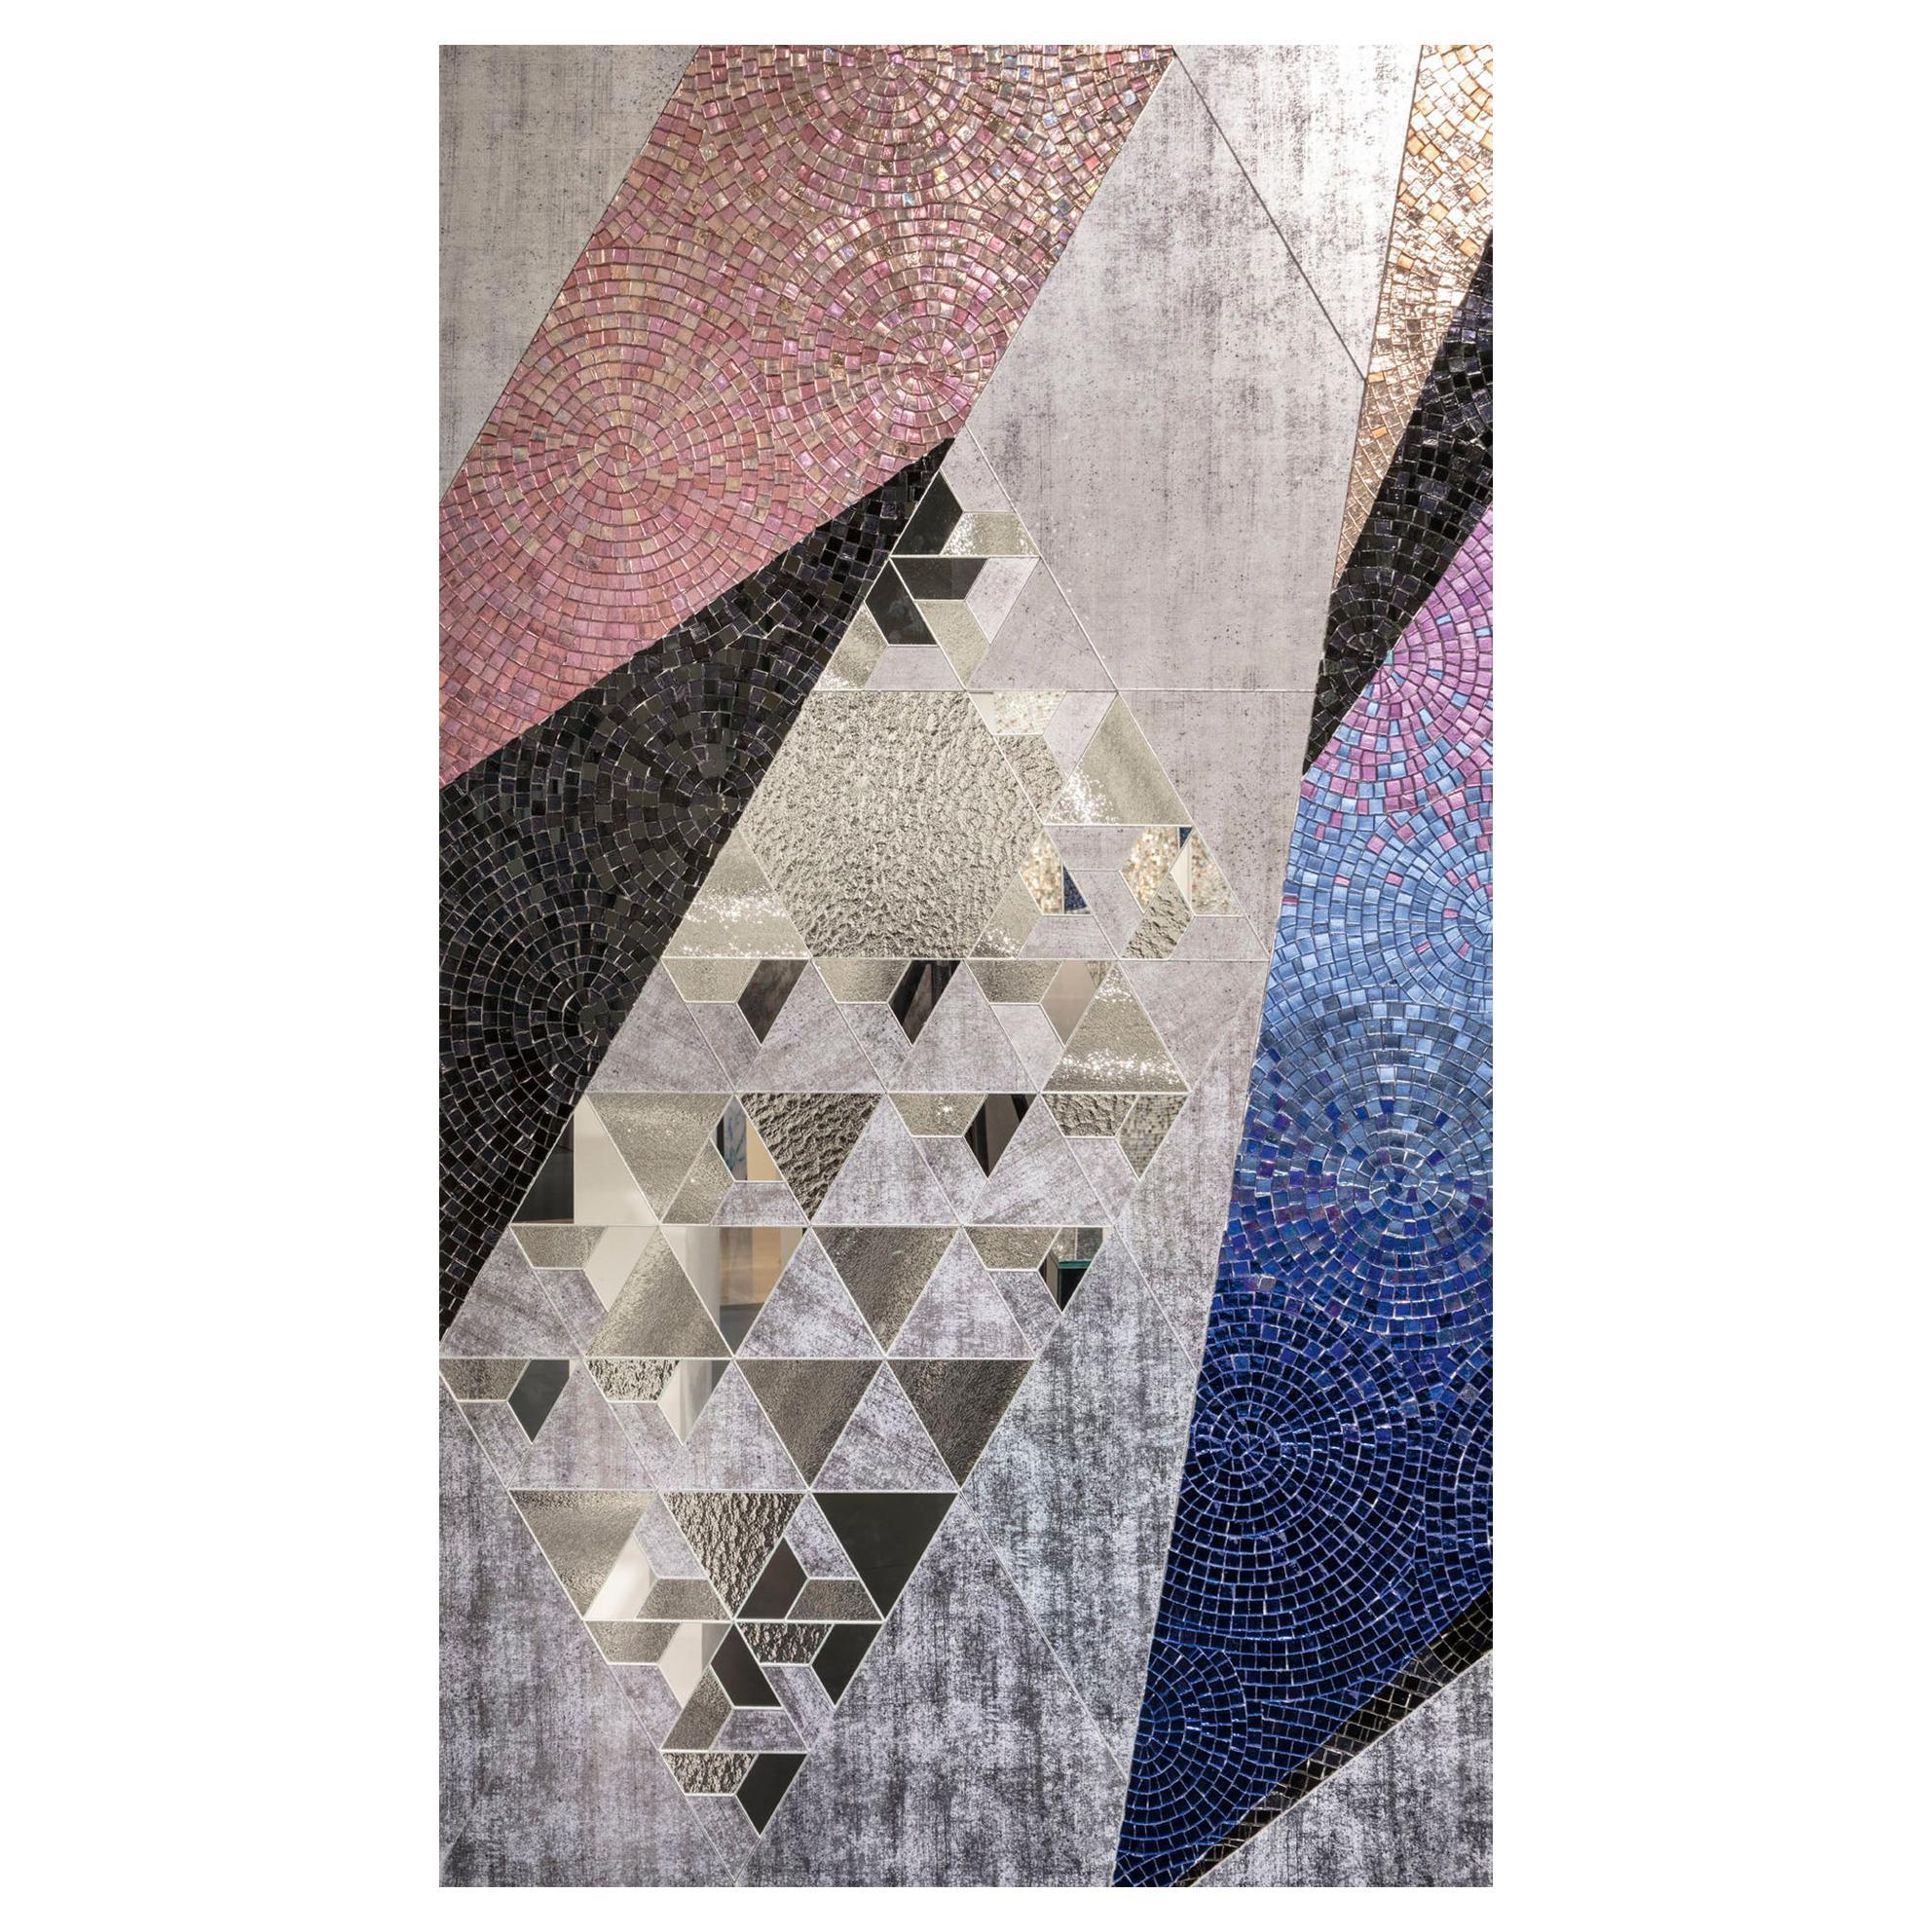 Art Glass & Geometric Mosaic Wall Decorative Panel Dimension Customizable